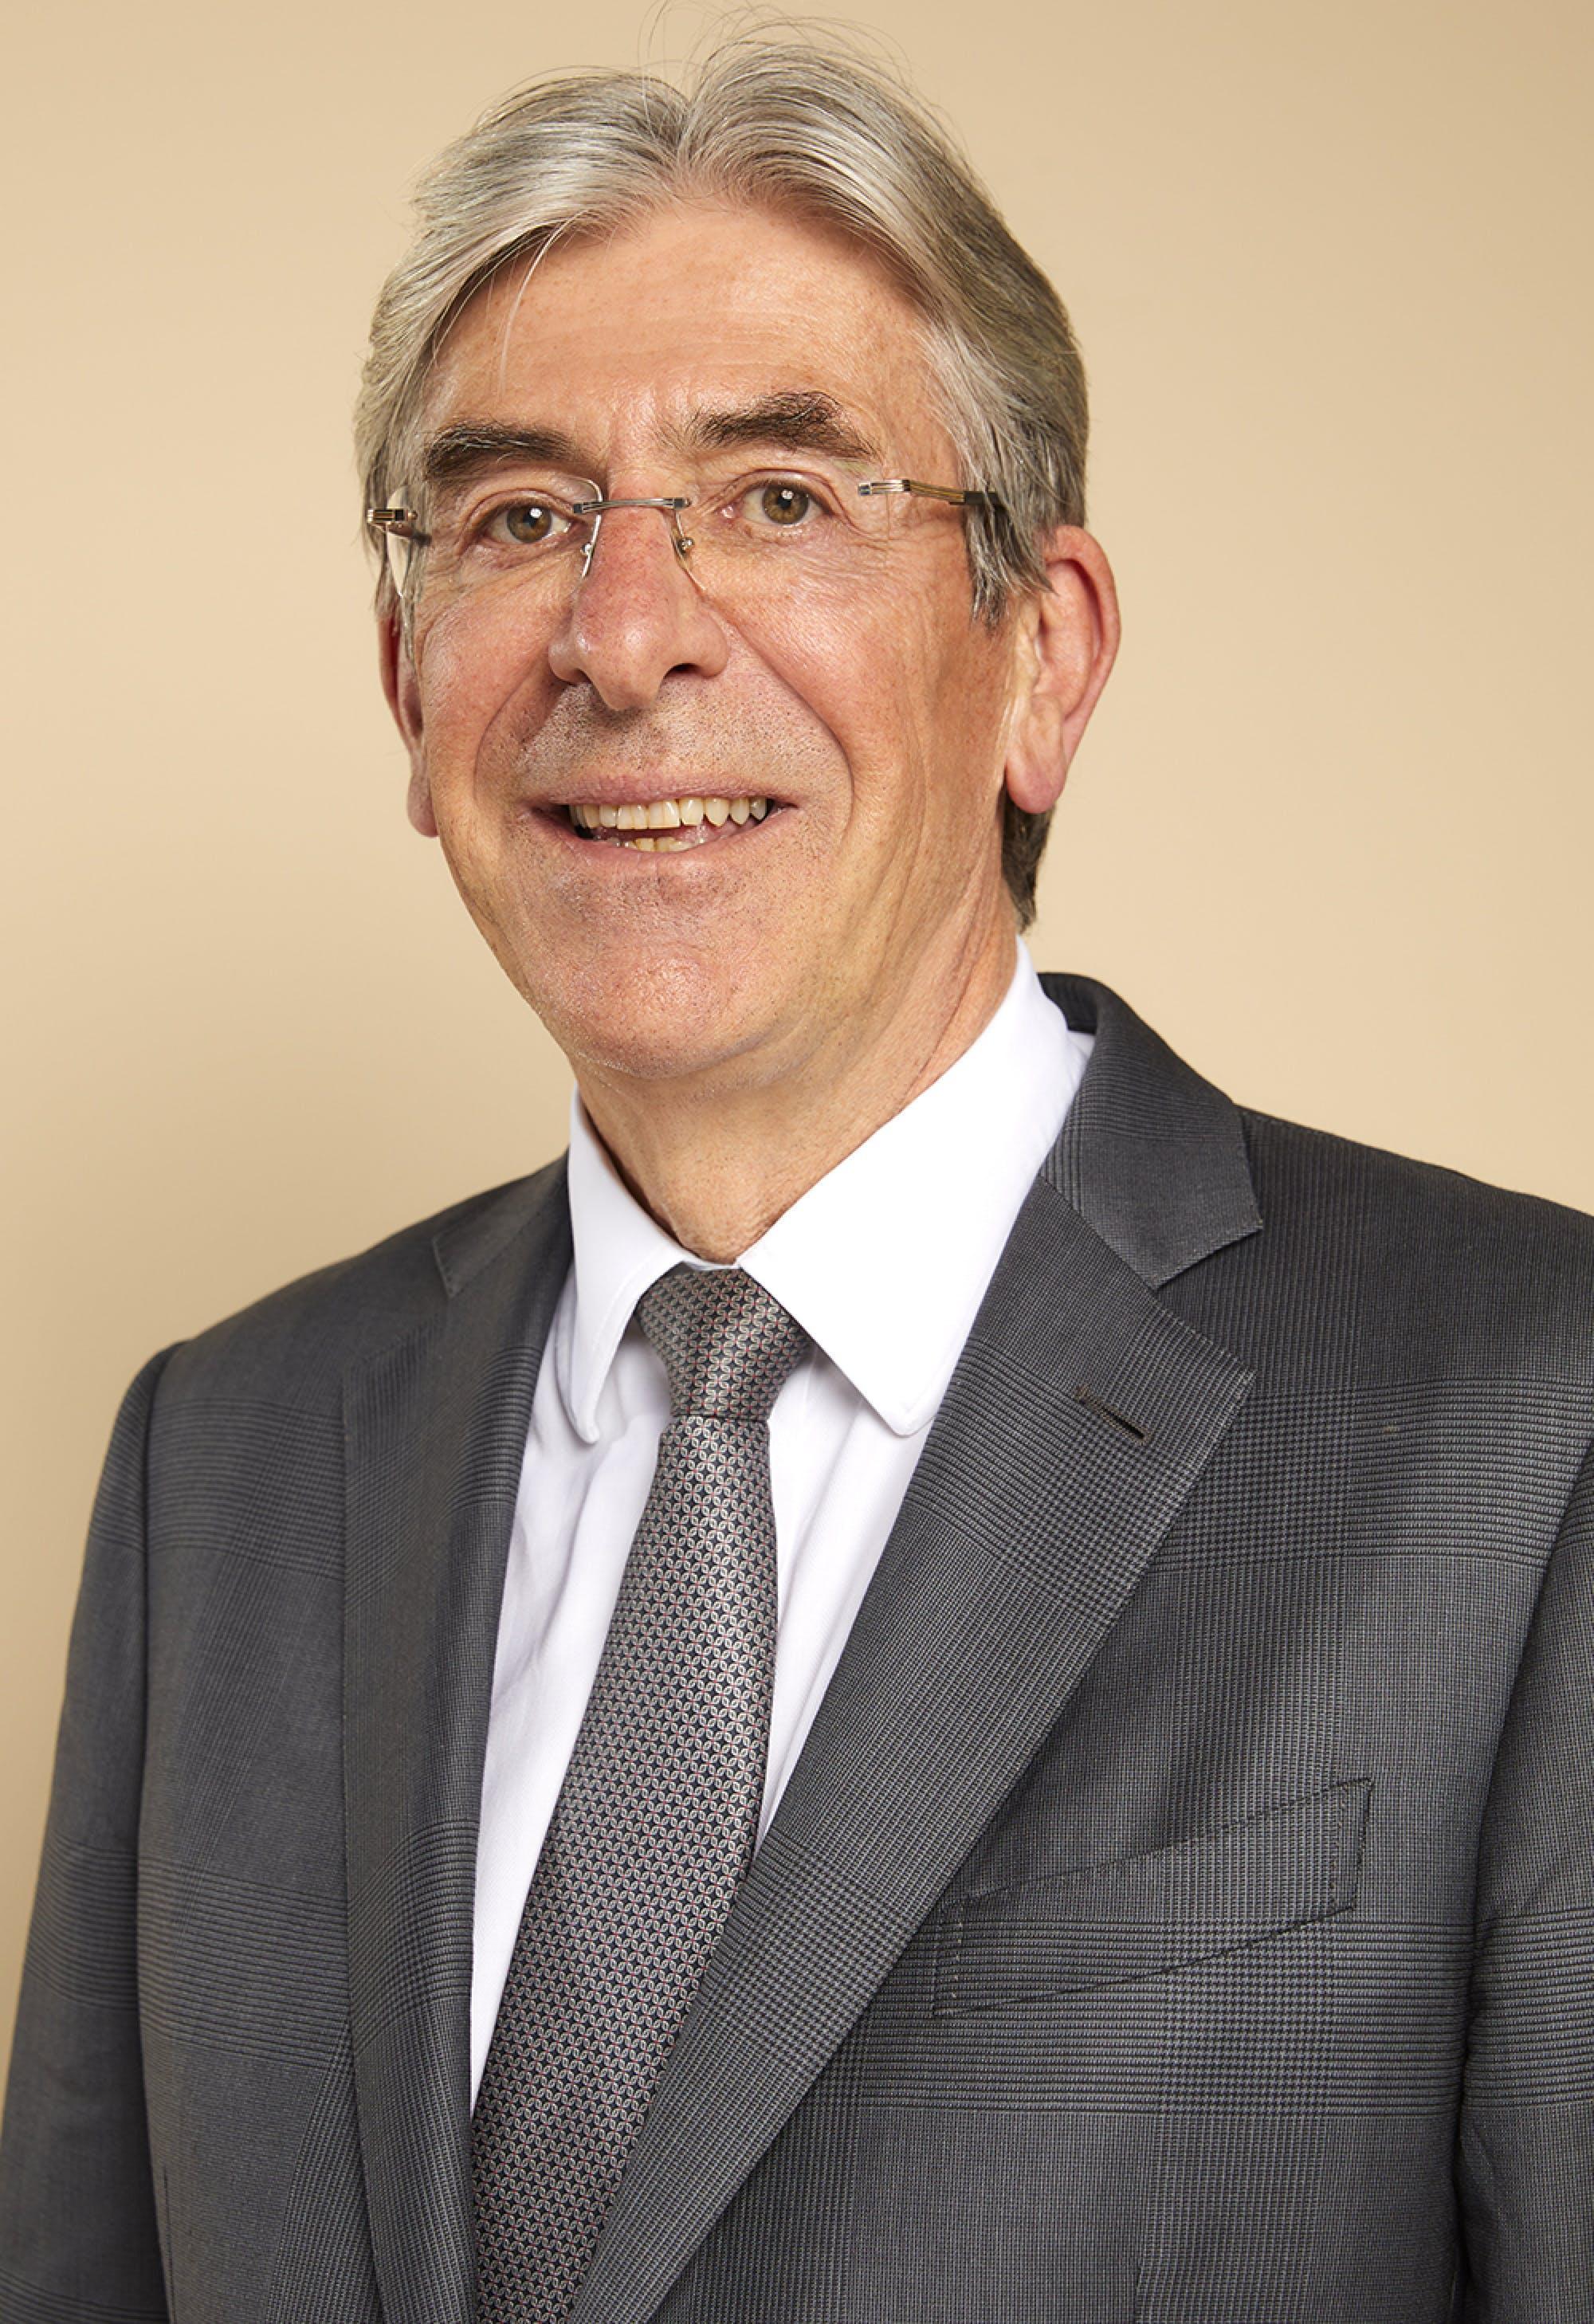 Walpole Programmes Regent's University London Professorship | An interview with Michael Ward, MD of Harrods and Chairman of Walpole